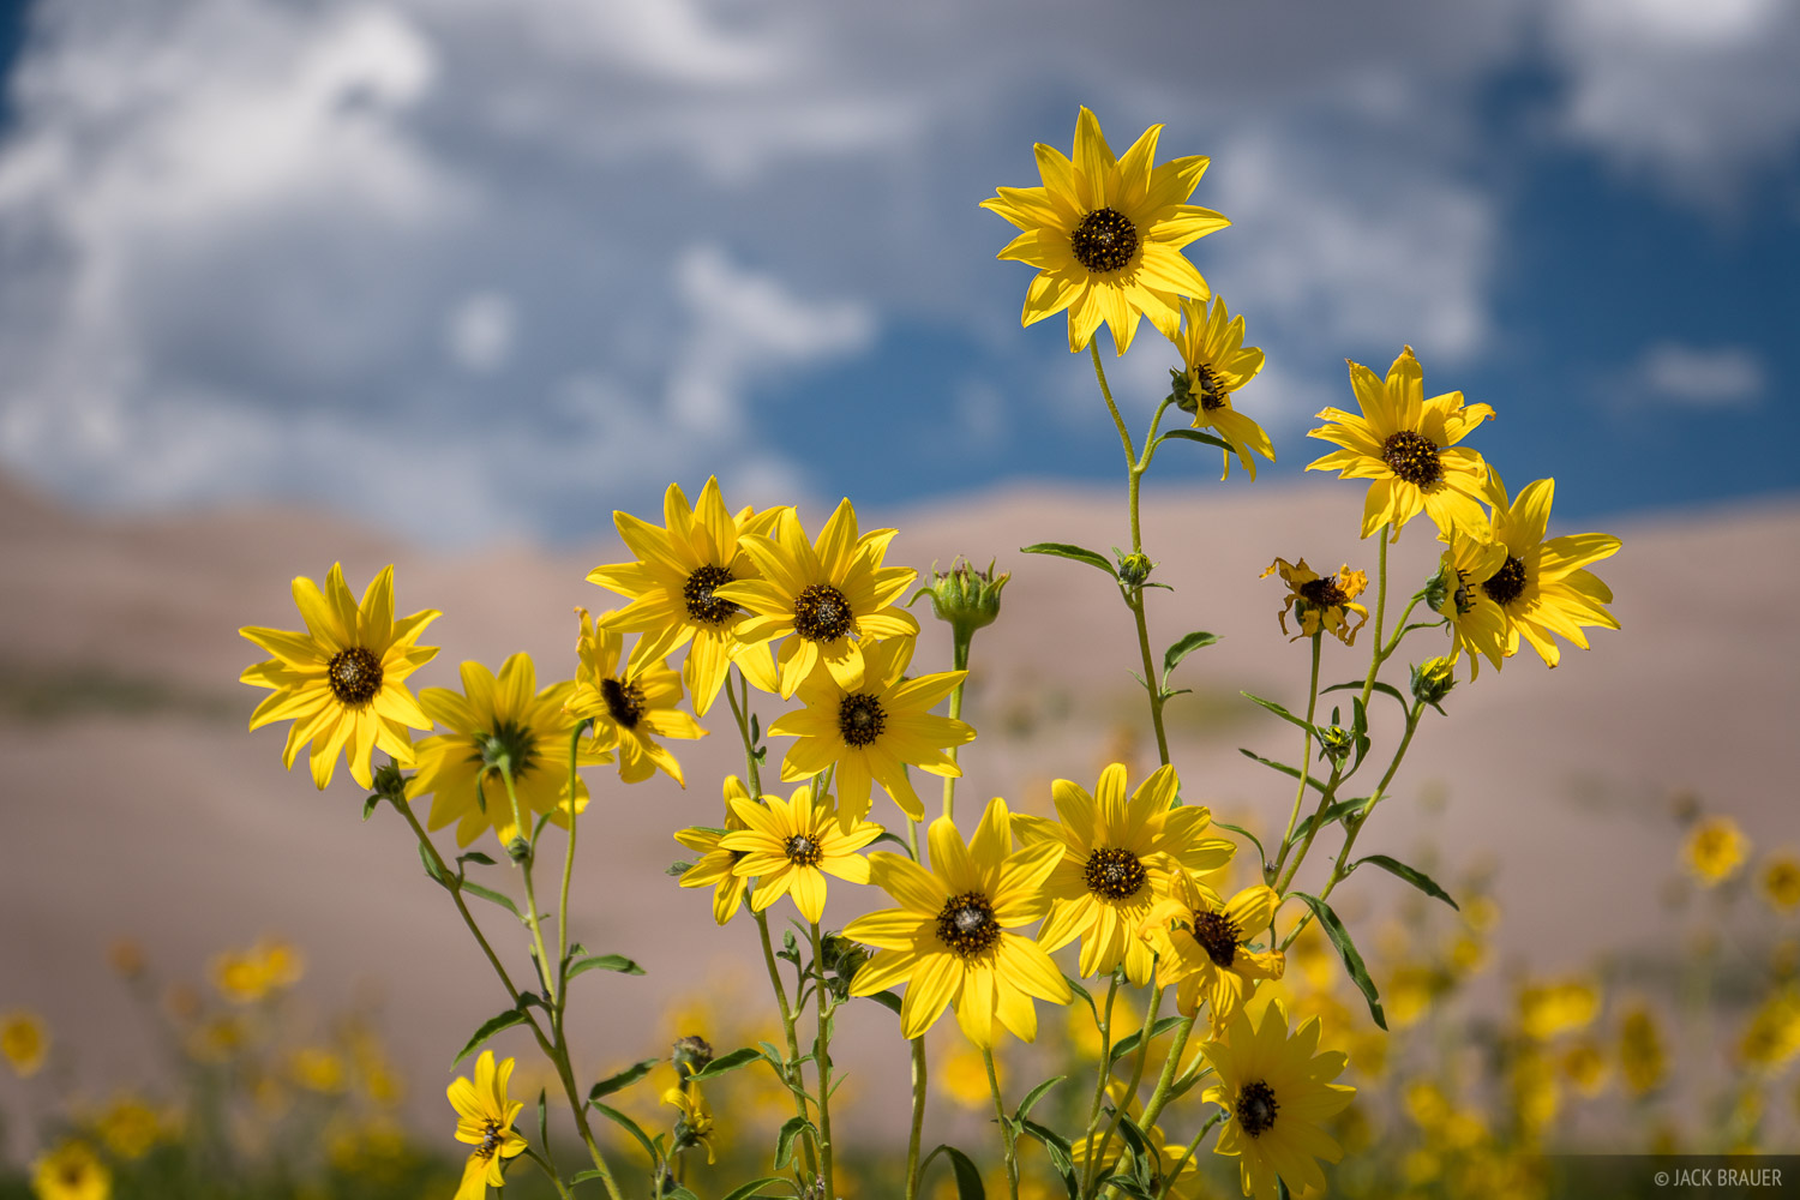 Colorado, Great Sand Dunes, wildflowers, sunflowers, photo